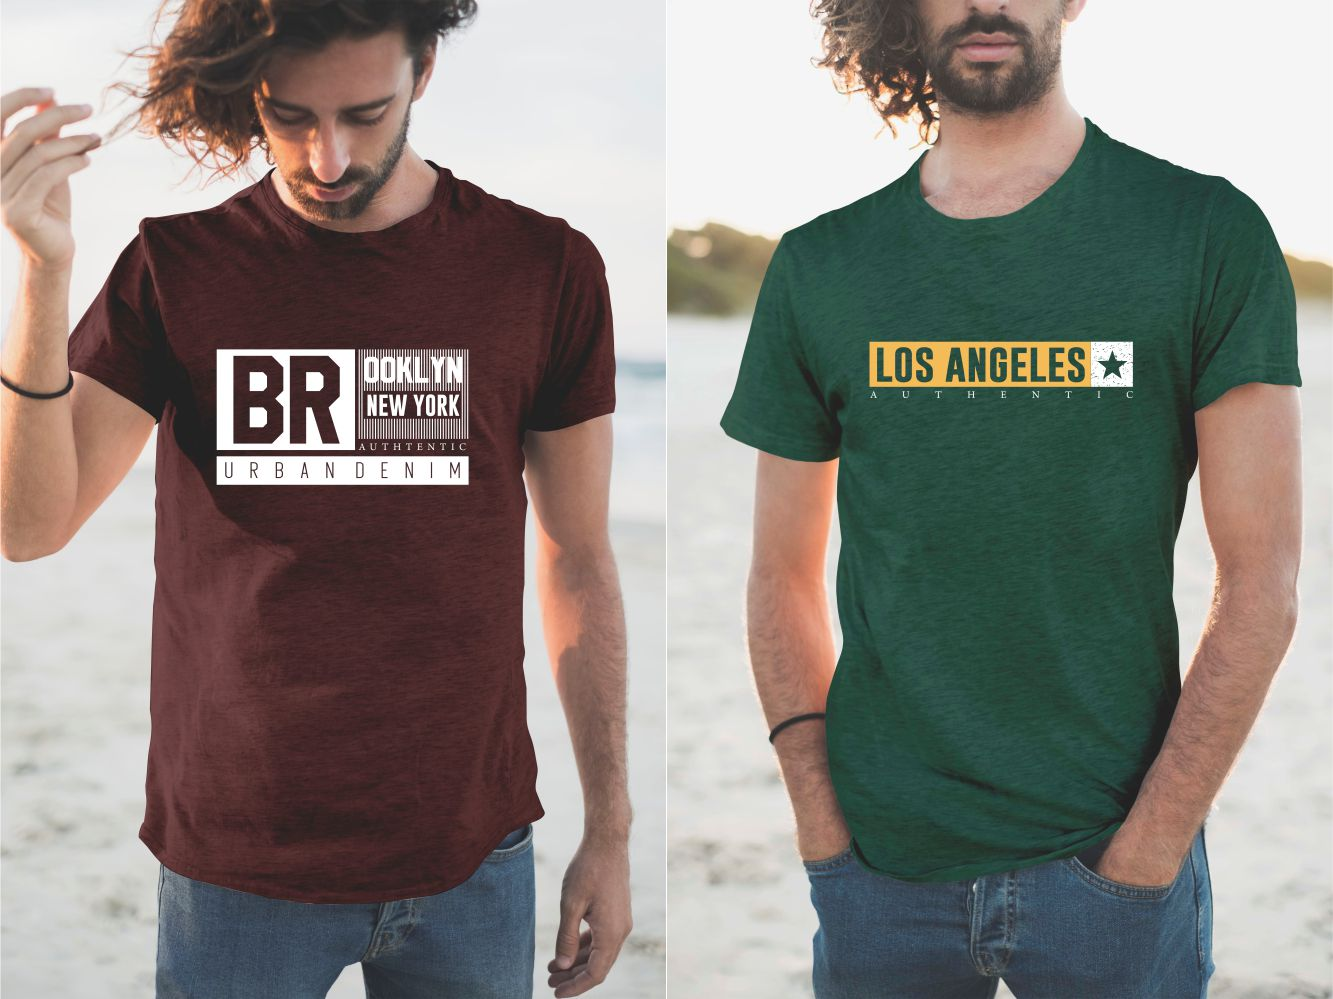 106 Urban T-shirt Designs Collection - 24 1